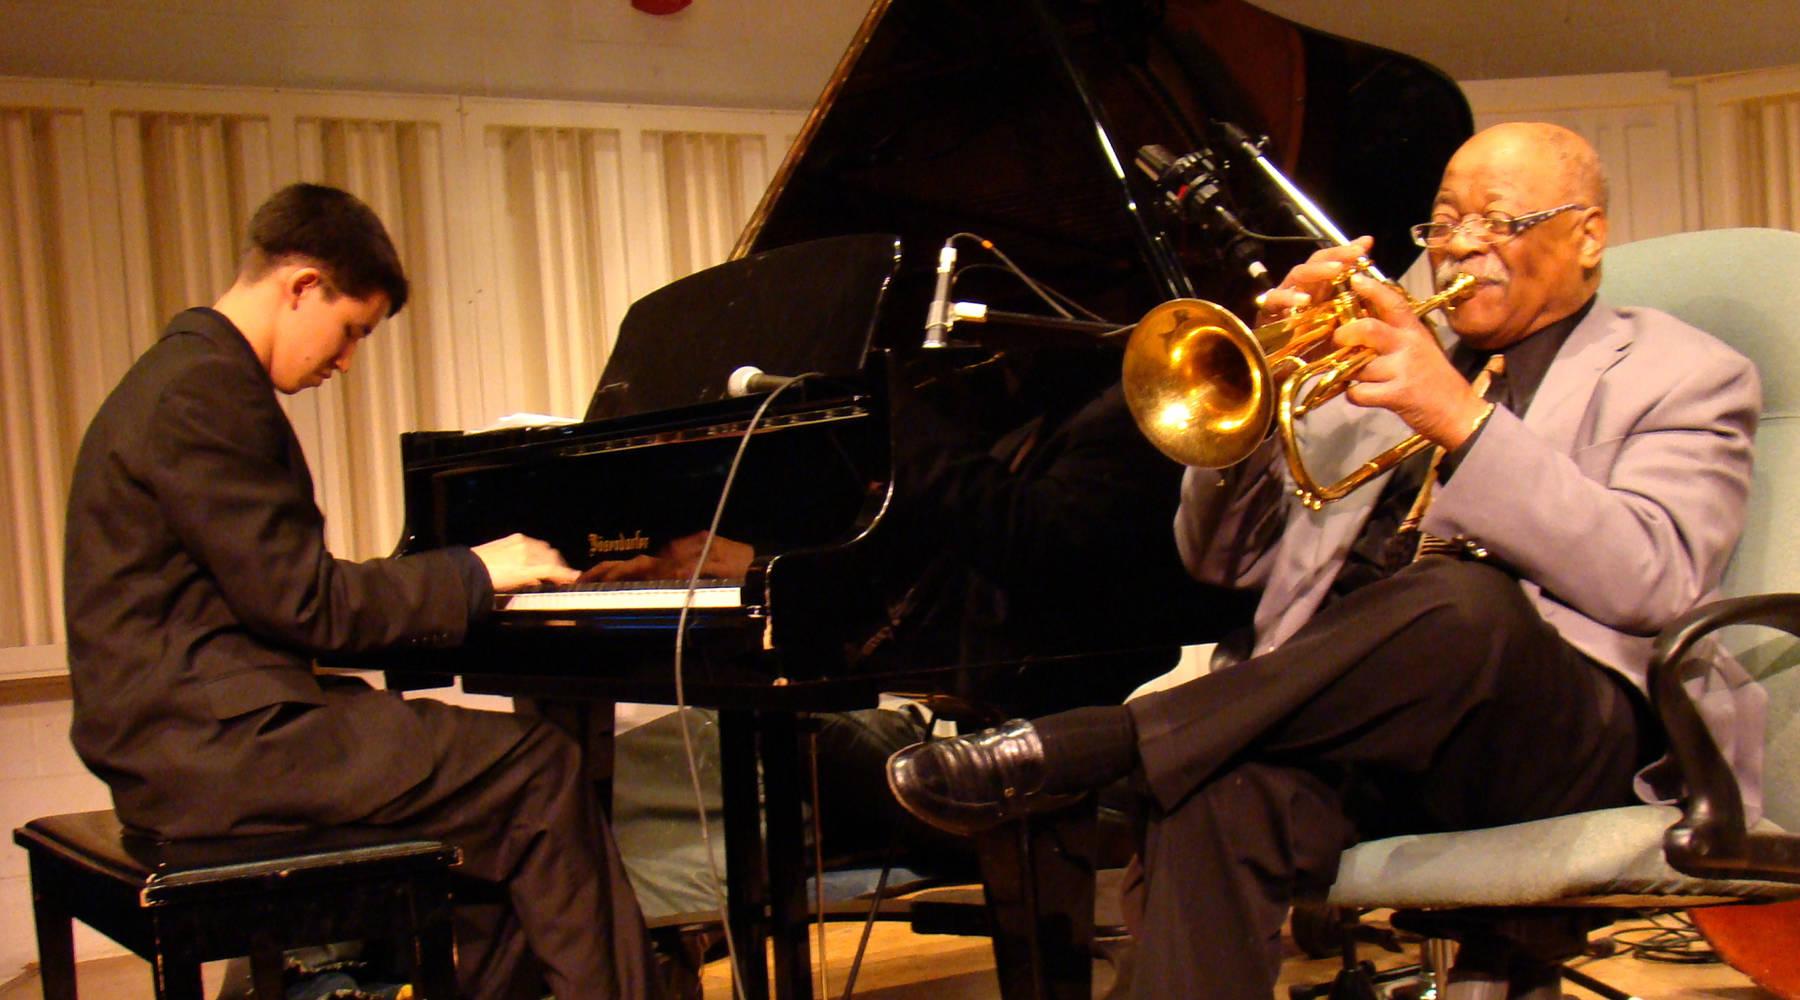 Quincy Jones on Clark Terry, a godfather of jazz - Marketplace